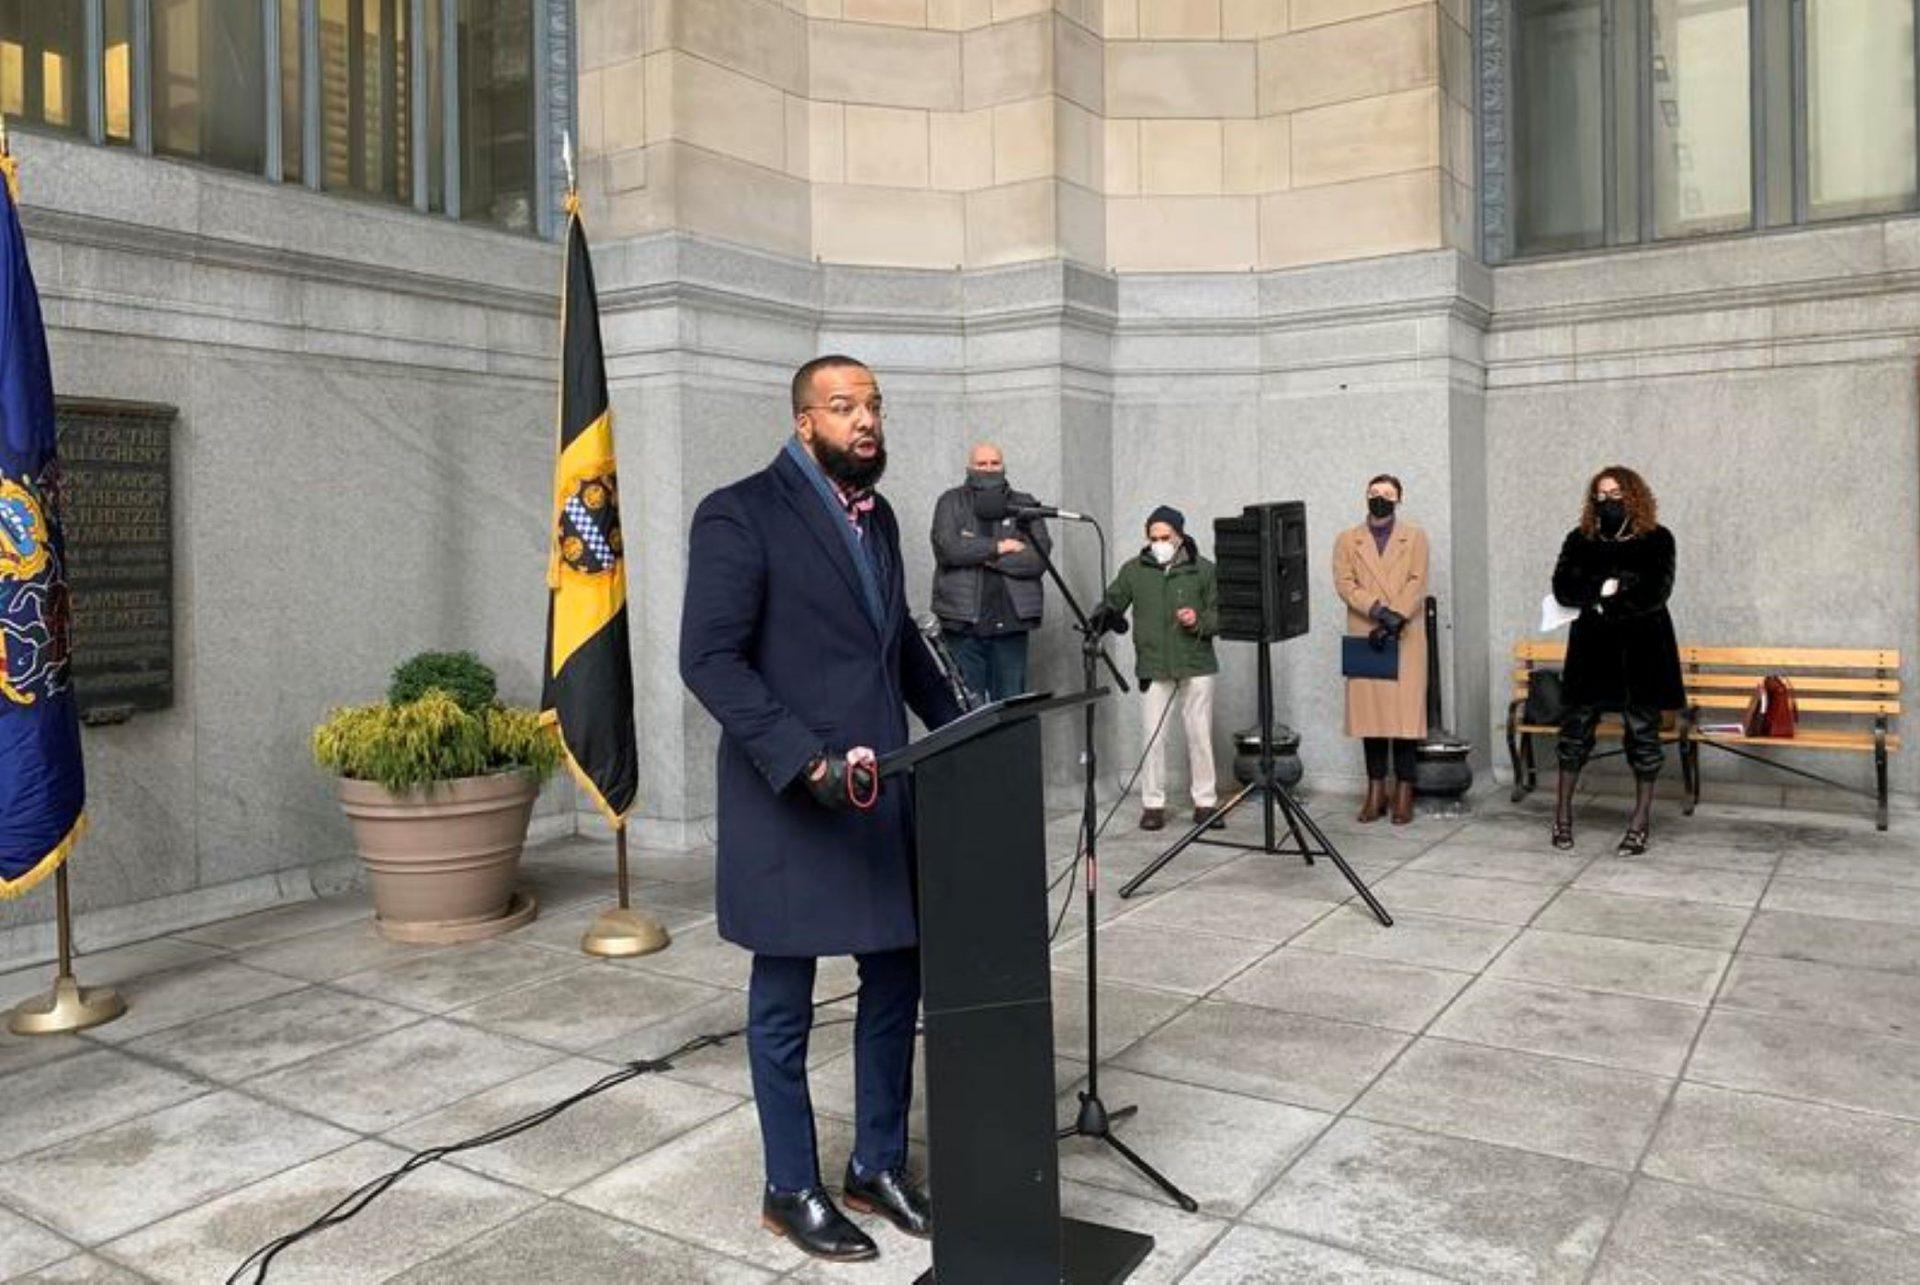 The Secretary of Pennsylvania's Board of Pardons, Brandon Flood, speaks outside Pittsburgh's City-County Building Friday, Feb. 12, 2021.